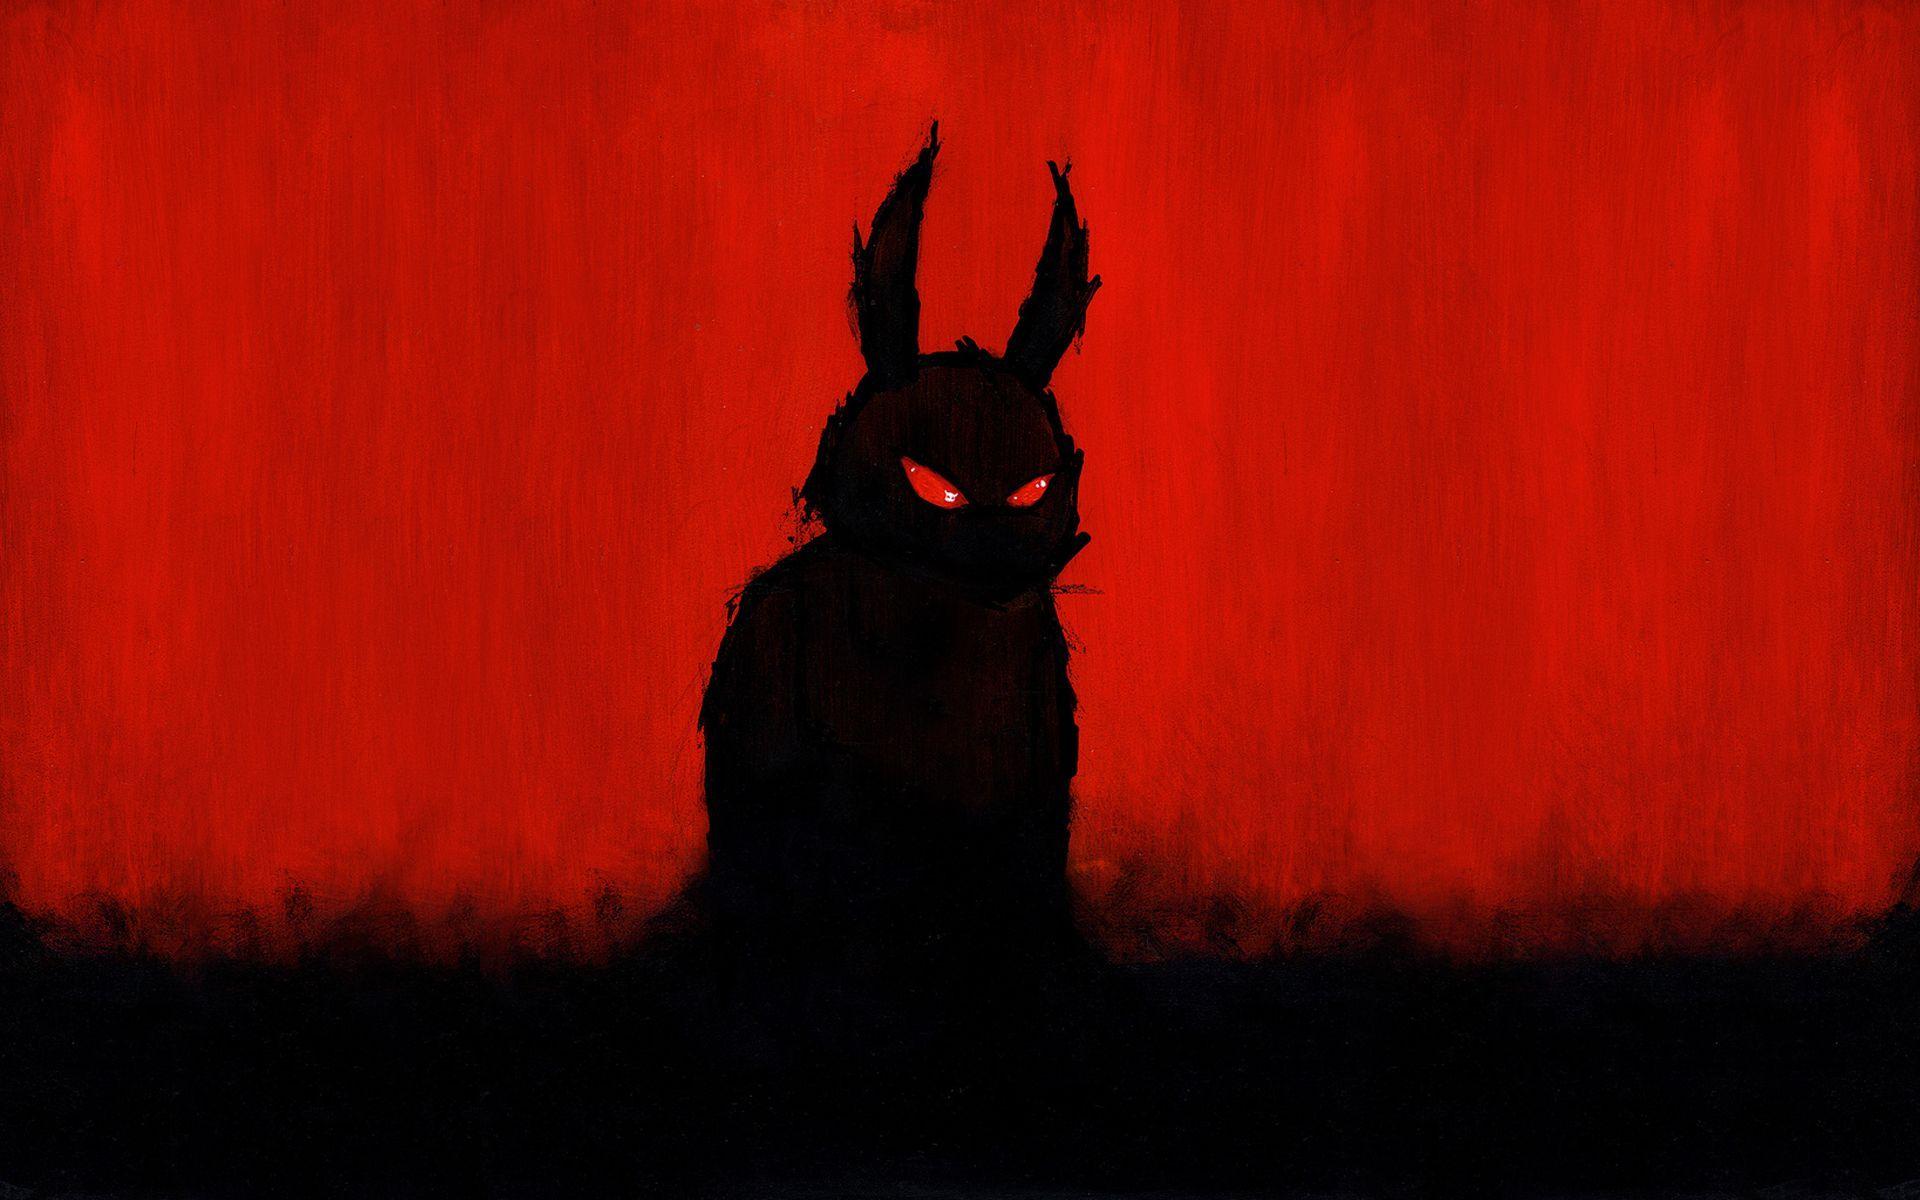 Evil HD wallpapers, Desktop wallpaper - most viewed